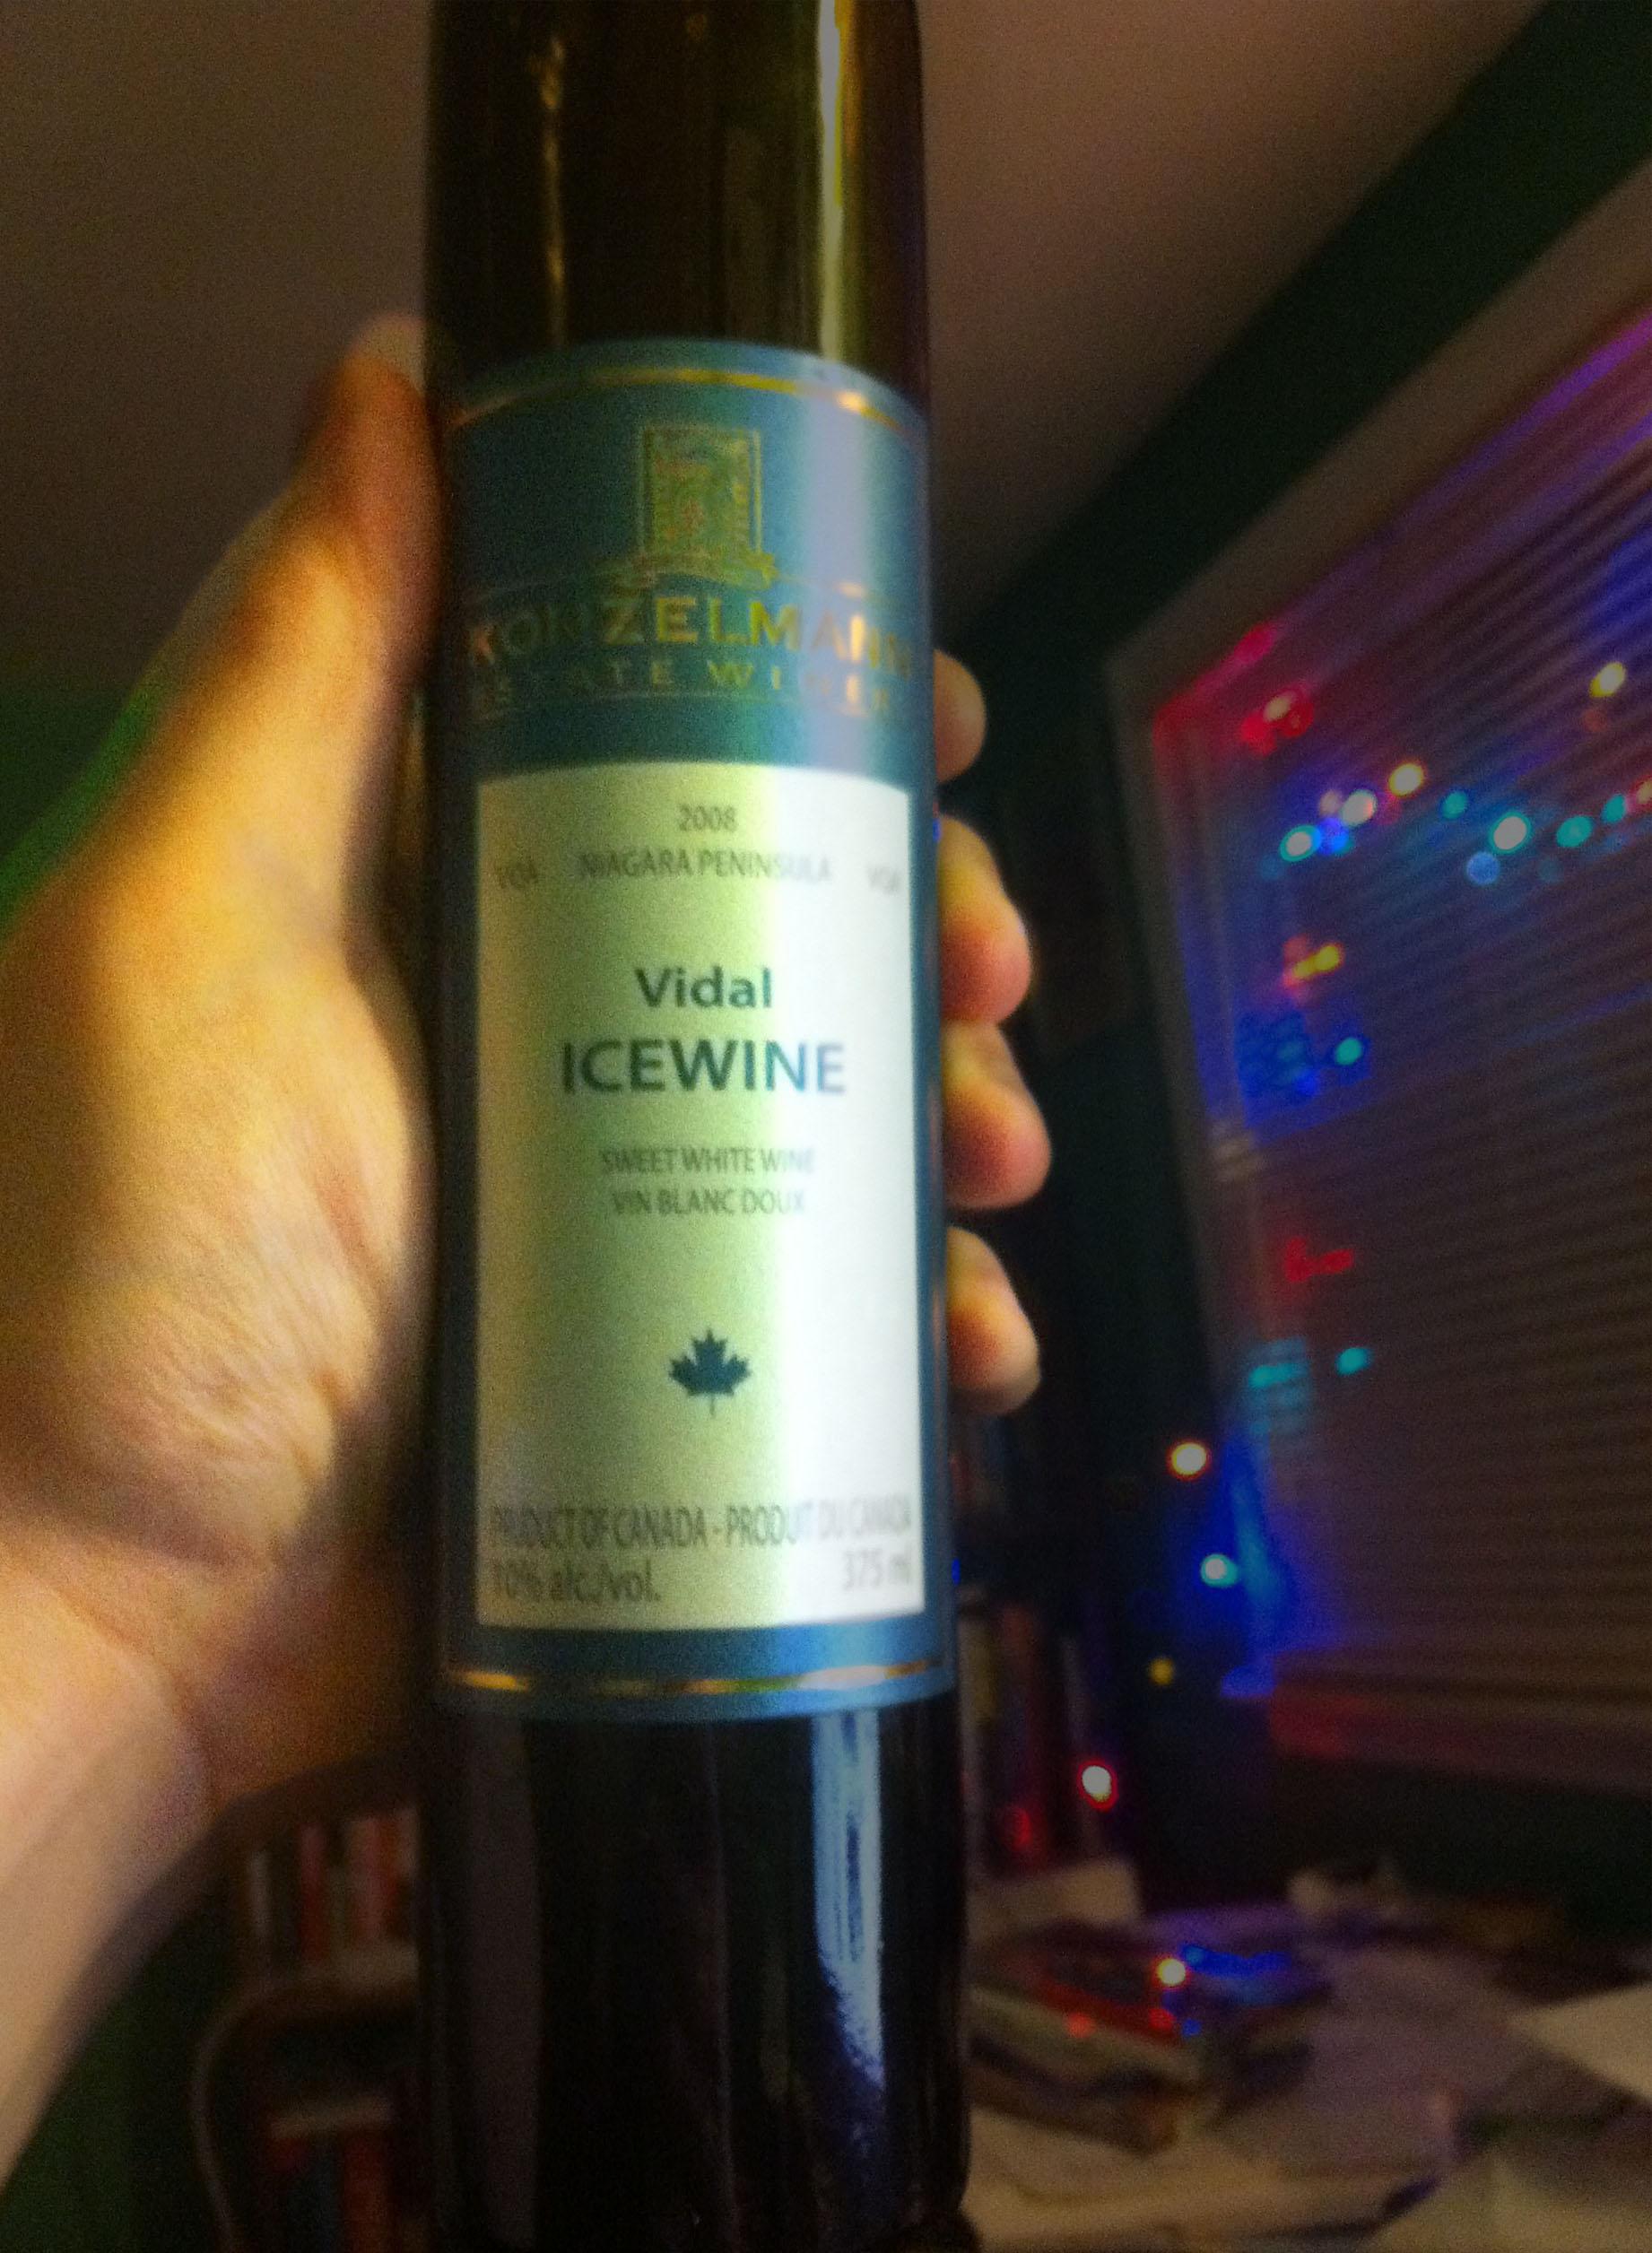 A 375 ml bottle of Konzelmann Estates 2008 Vidal Icewine